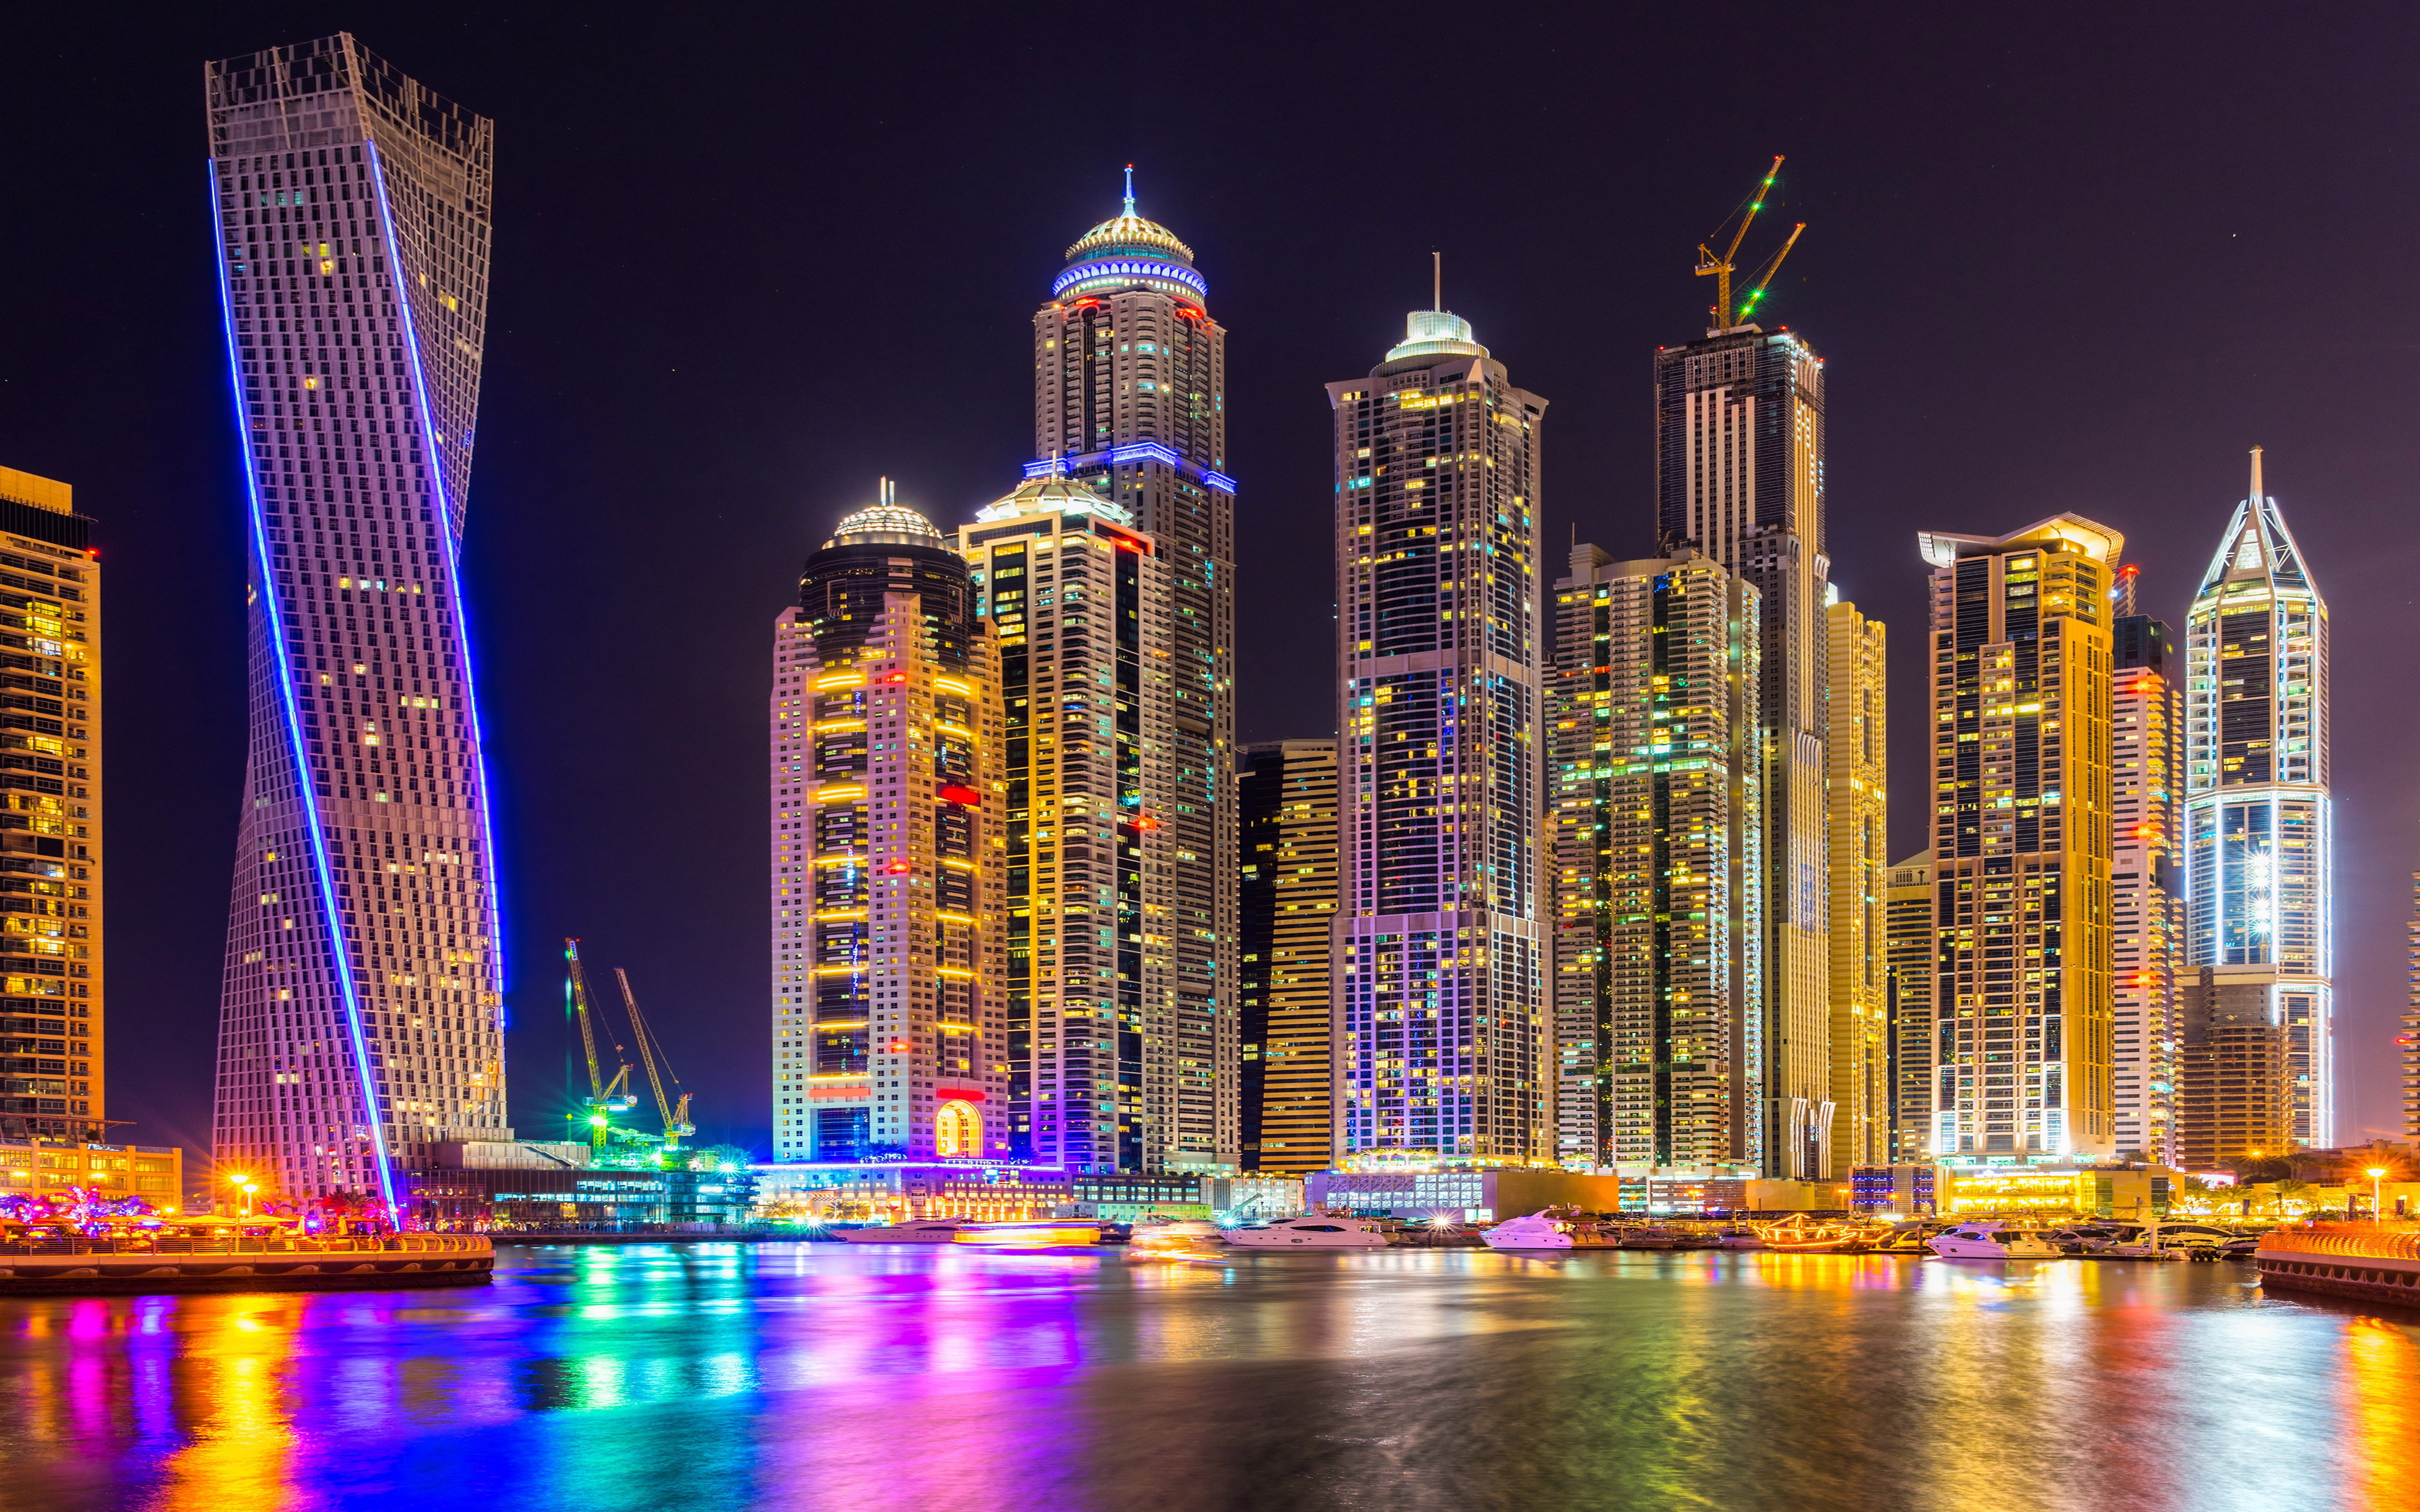 Car Desktop Wallpaper Hd 3d Full Screen Free Download Dubai City Of Skyscrapers Tall Buildings Night Light